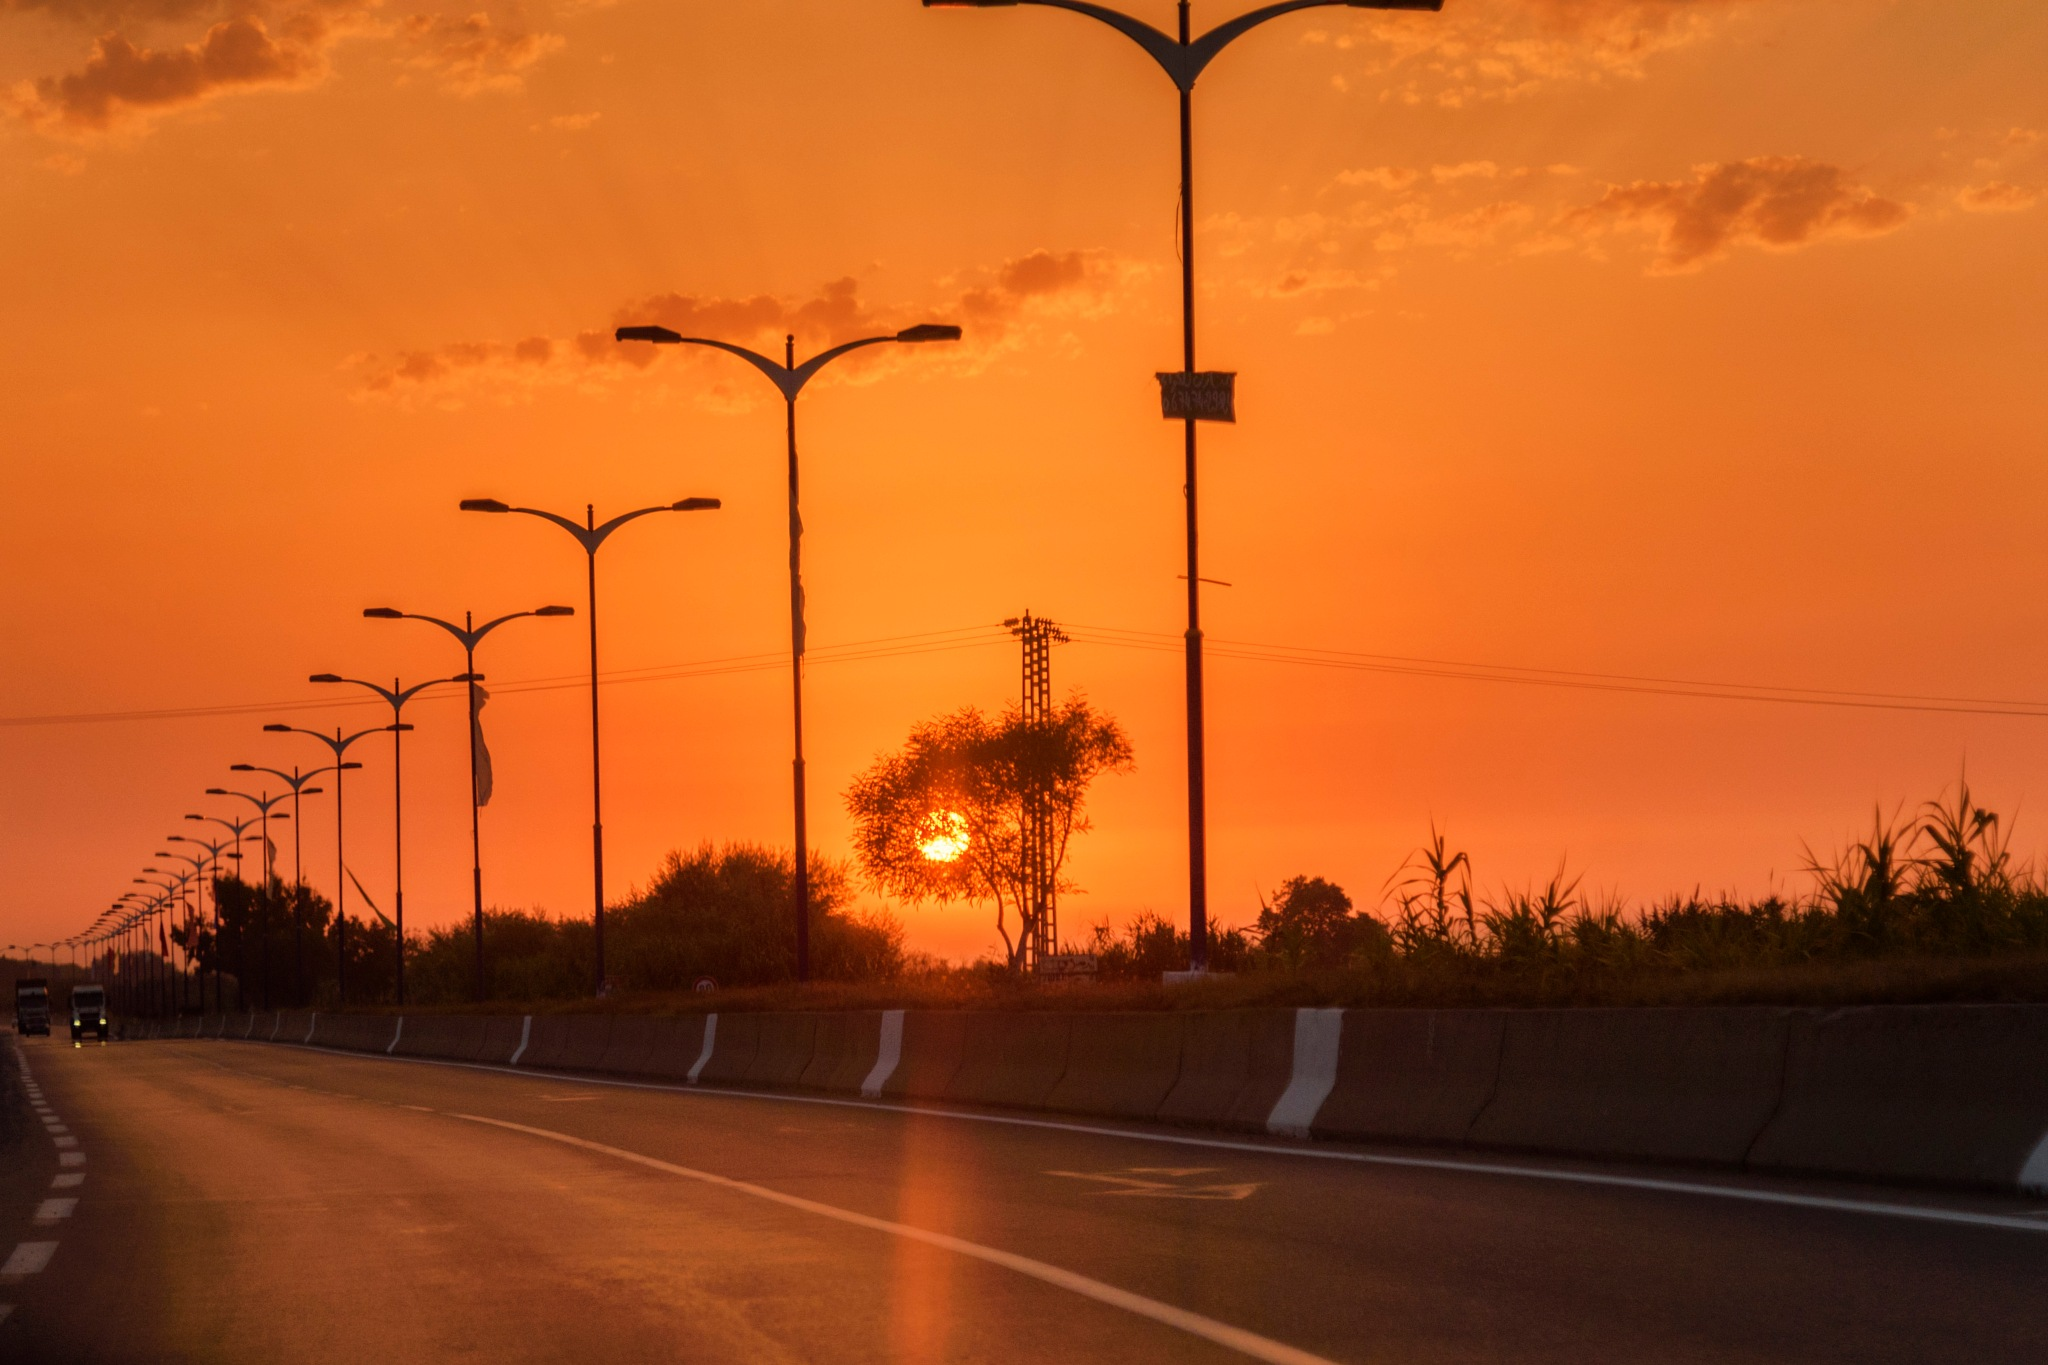 Sunset by Noureddine Belfethi